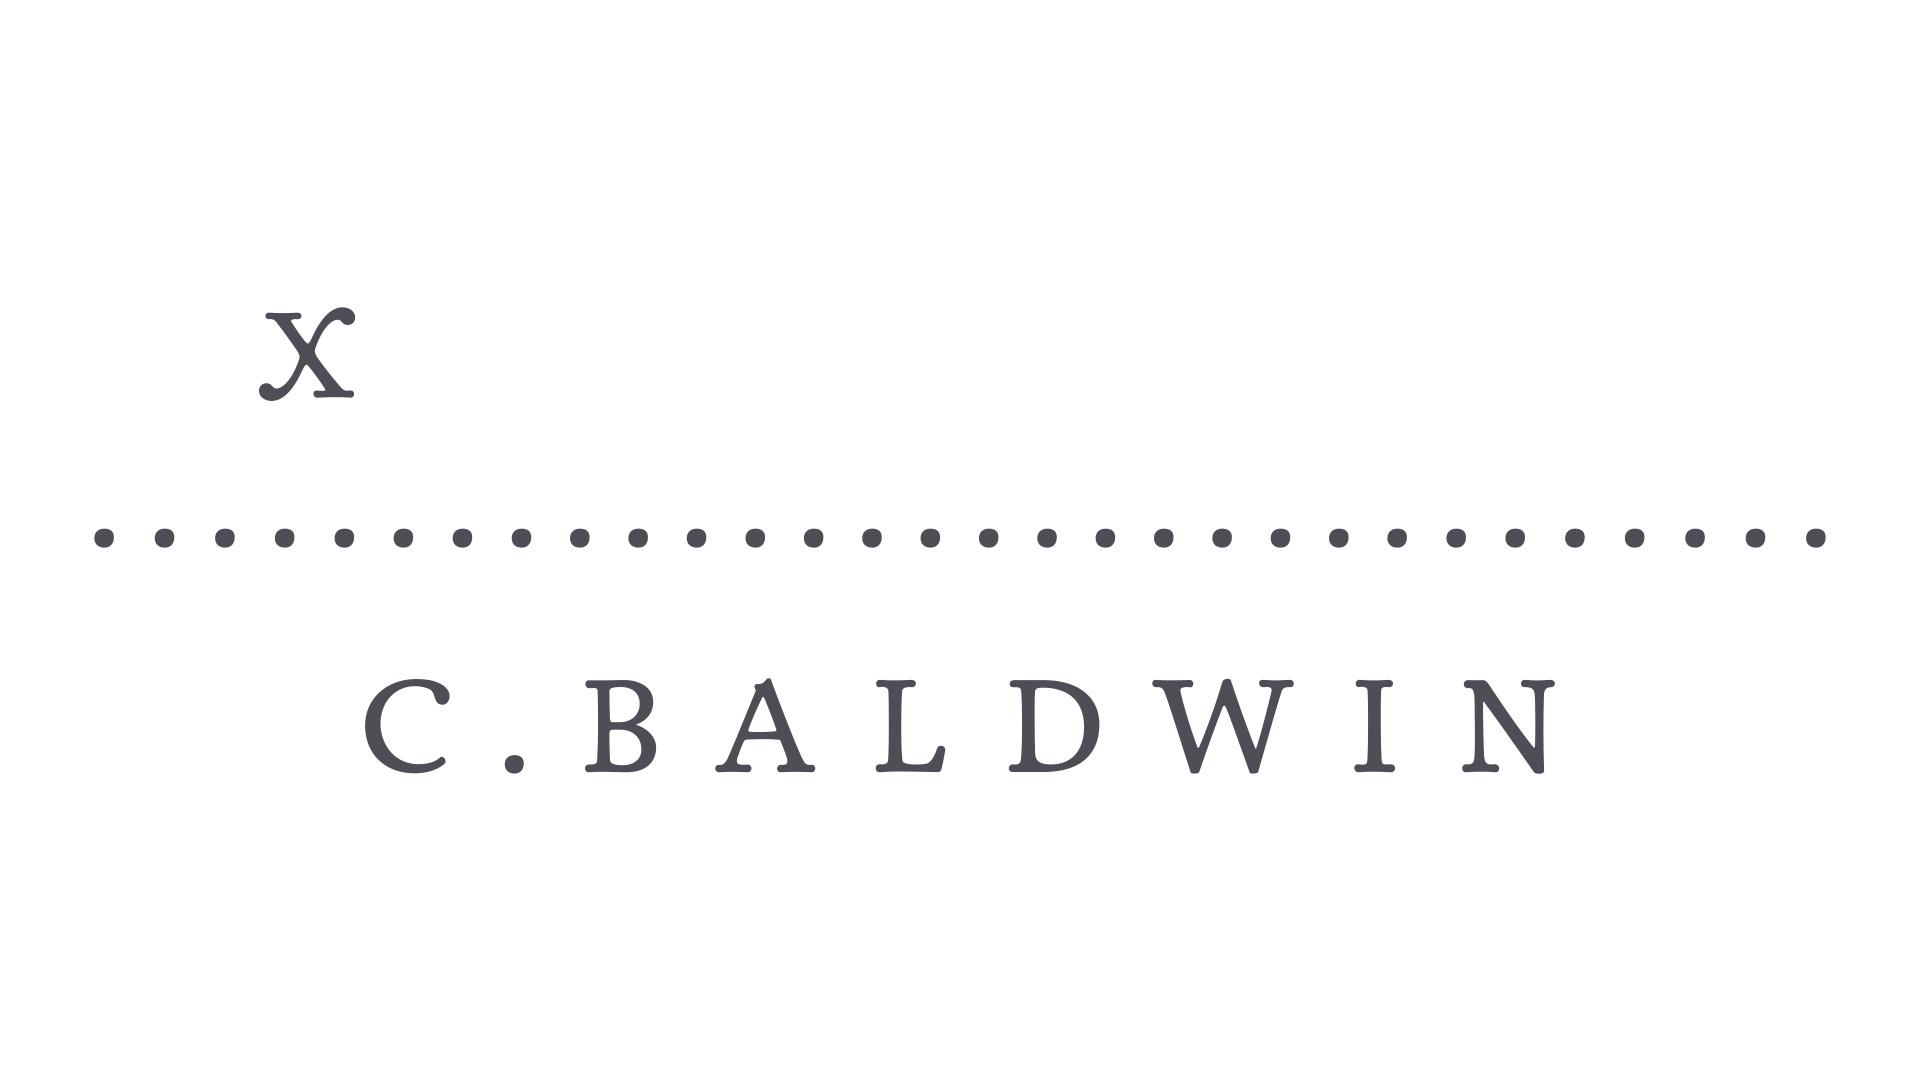 C Baldwin_logo_1920x1080